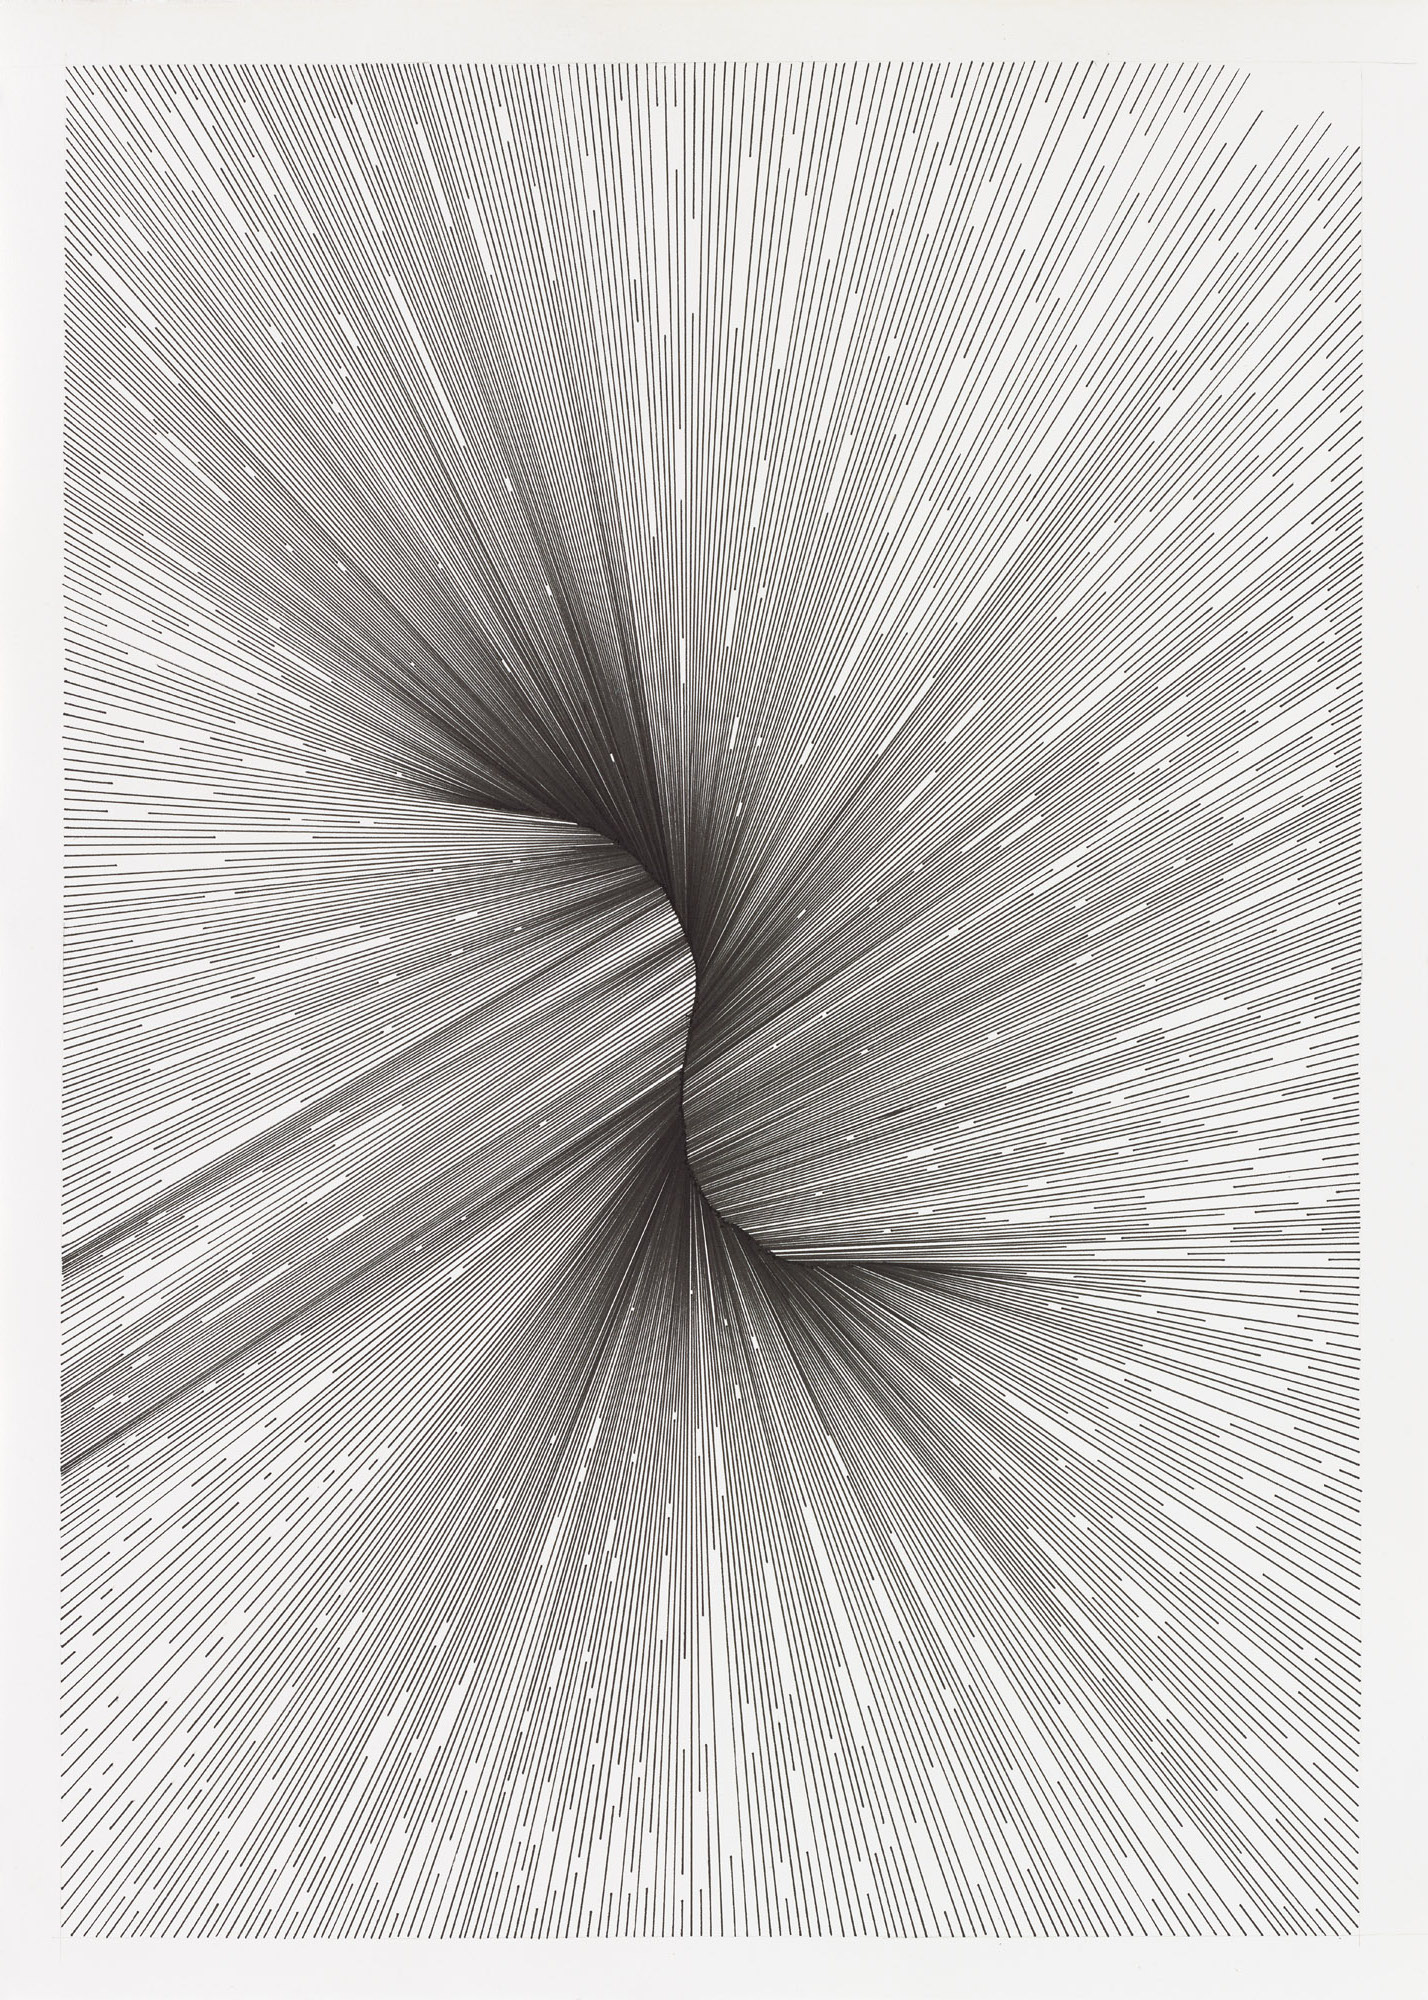 BK P18207 | untitled | pigment liner on paper | 59x42cm | 2016.jpg